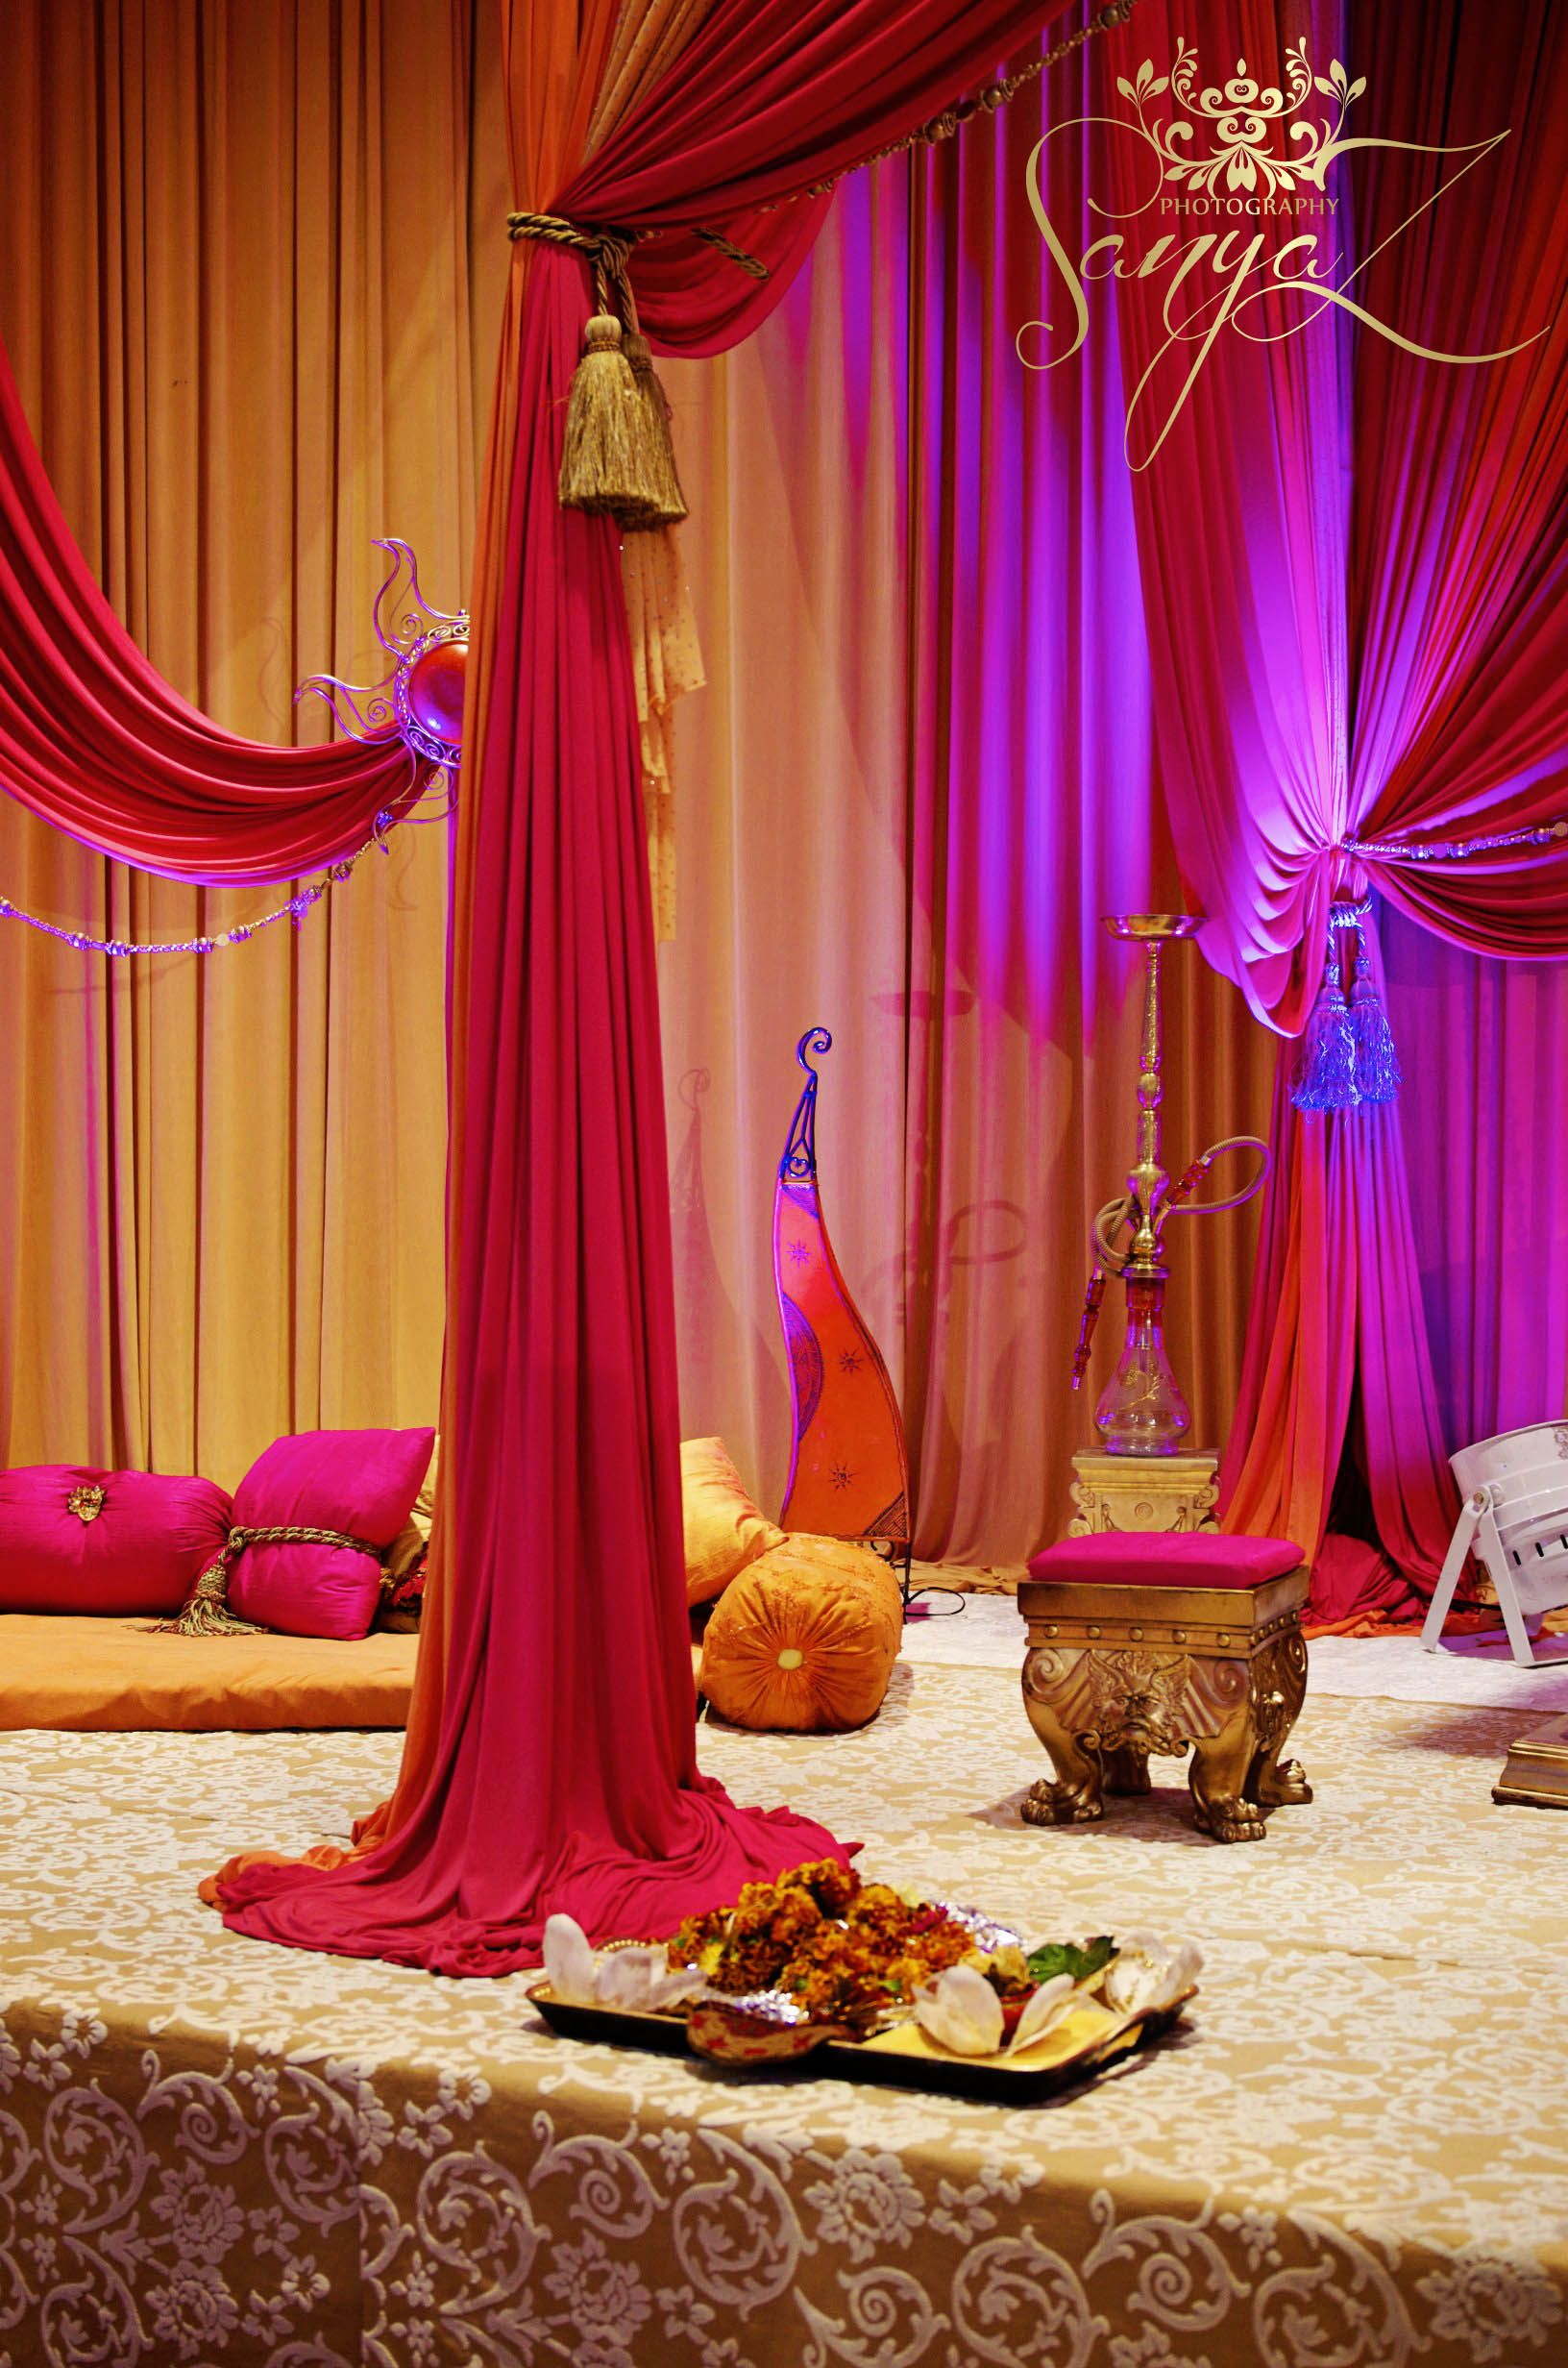 wedding stage decoration pics%0A Indian Sangeet Mehendi Stage